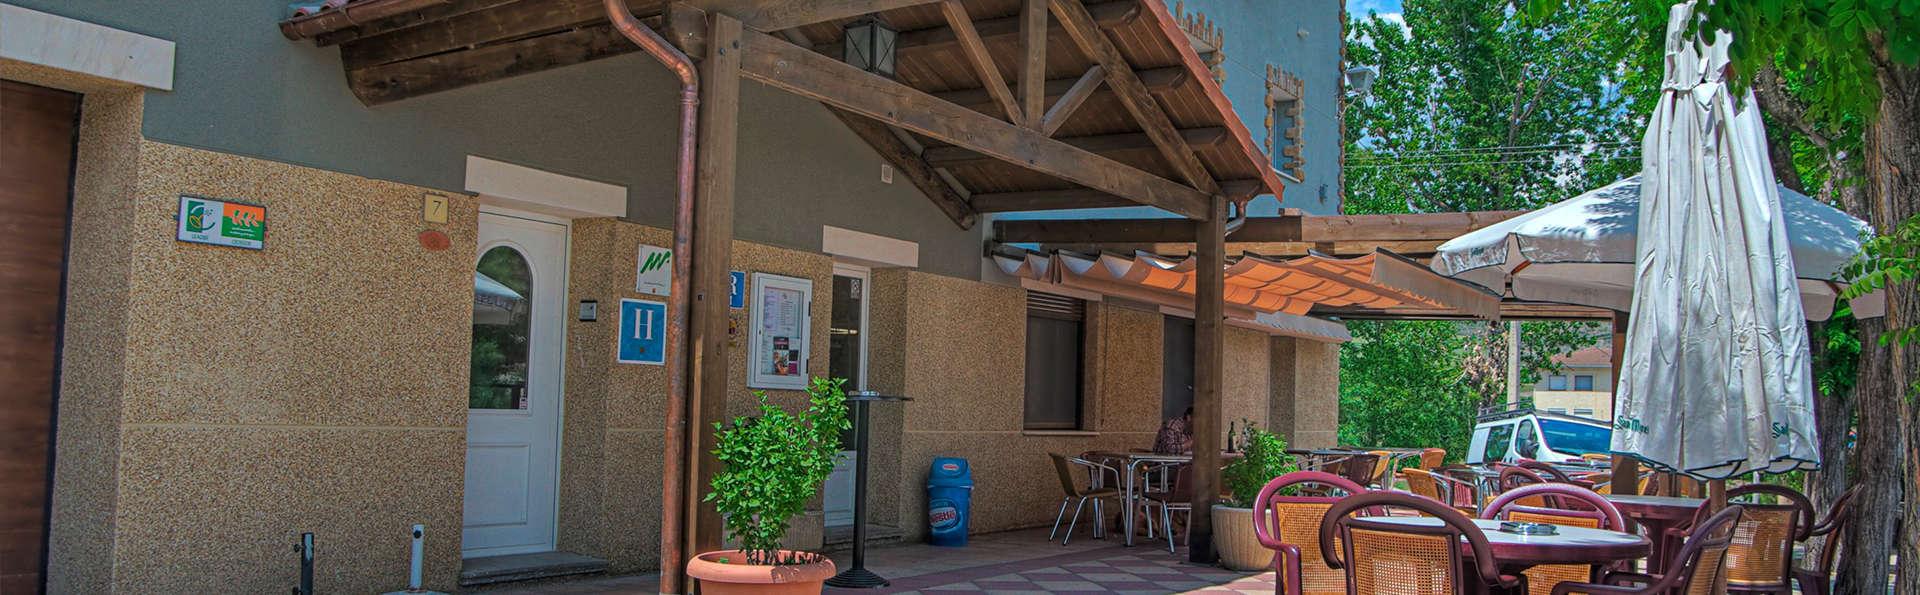 Hotel Casa Custodio - EDIT_front.jpg